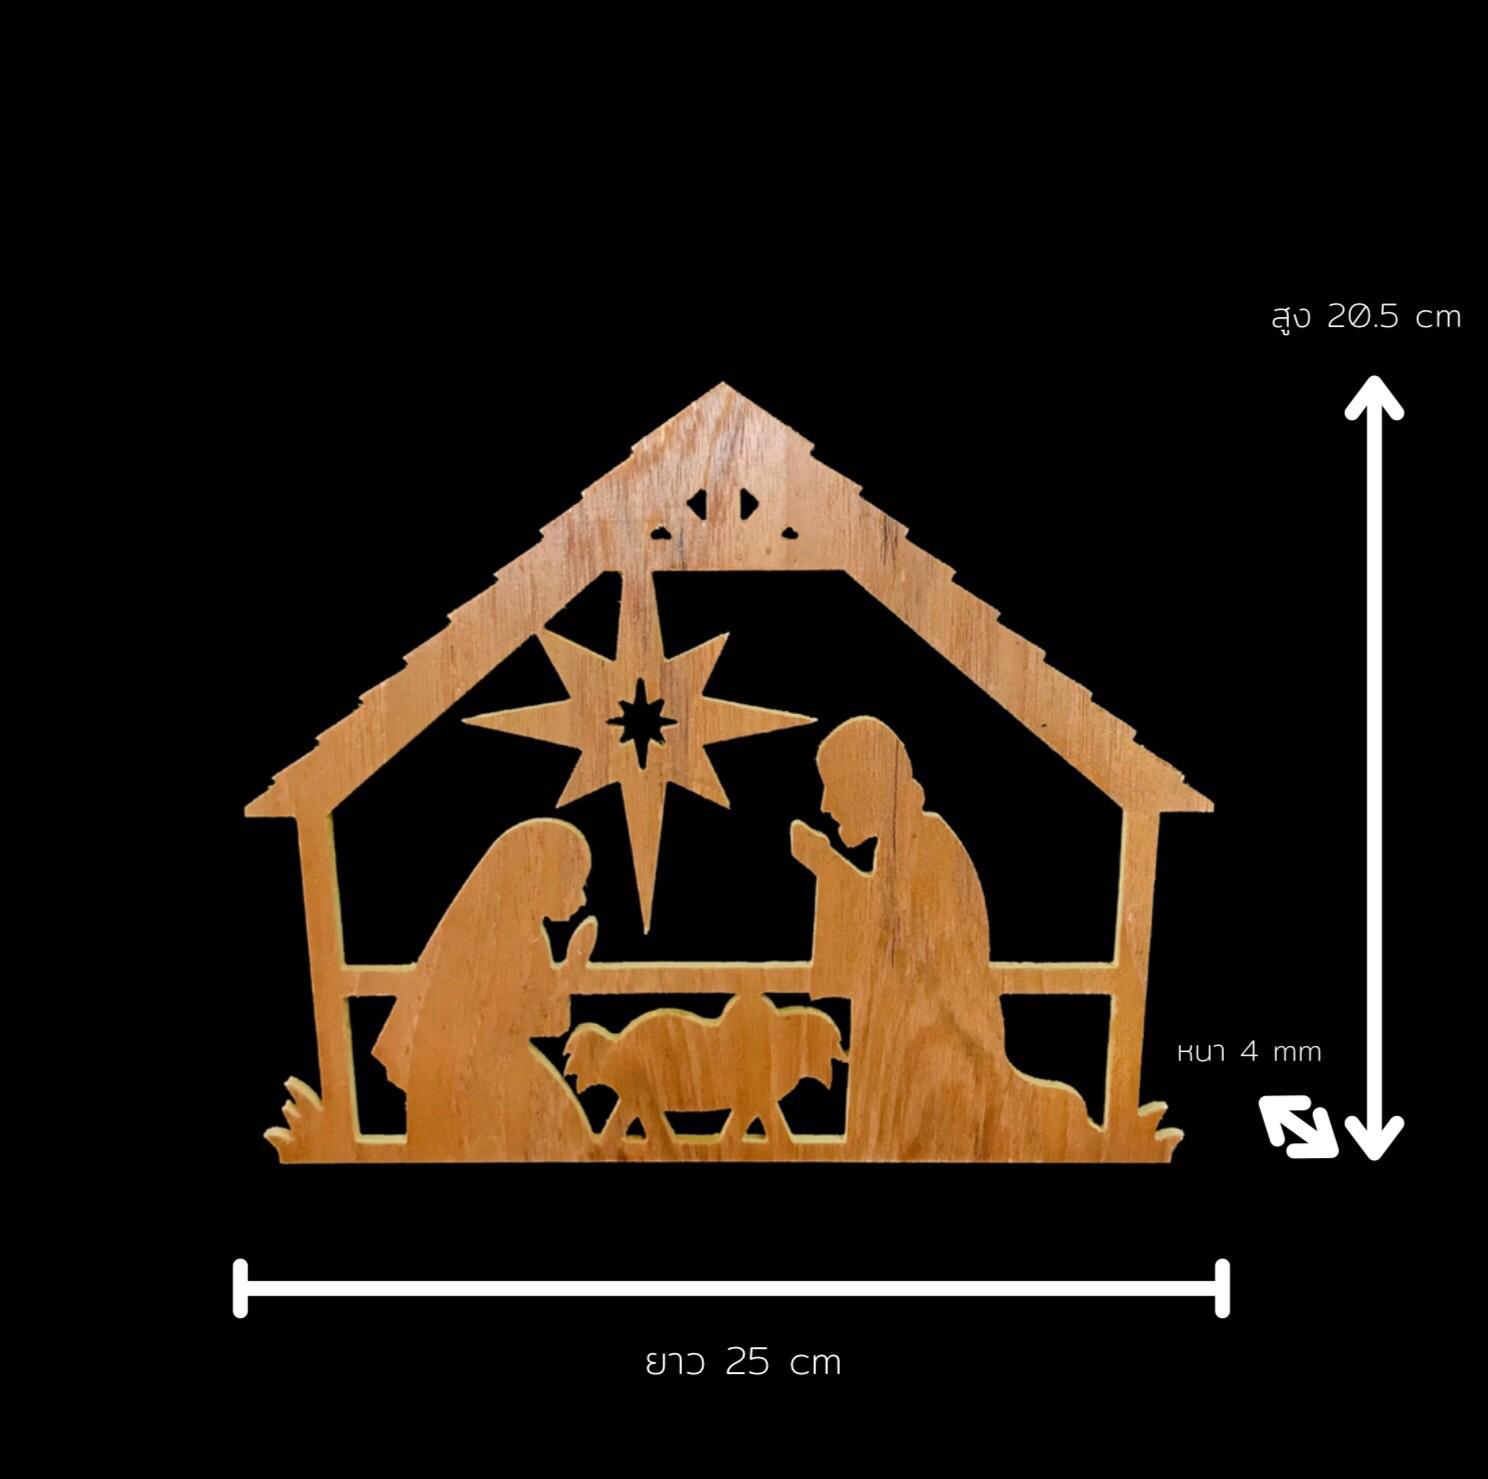 Nativity Cutout (พระทรงบังเกิดในโรงวัว)